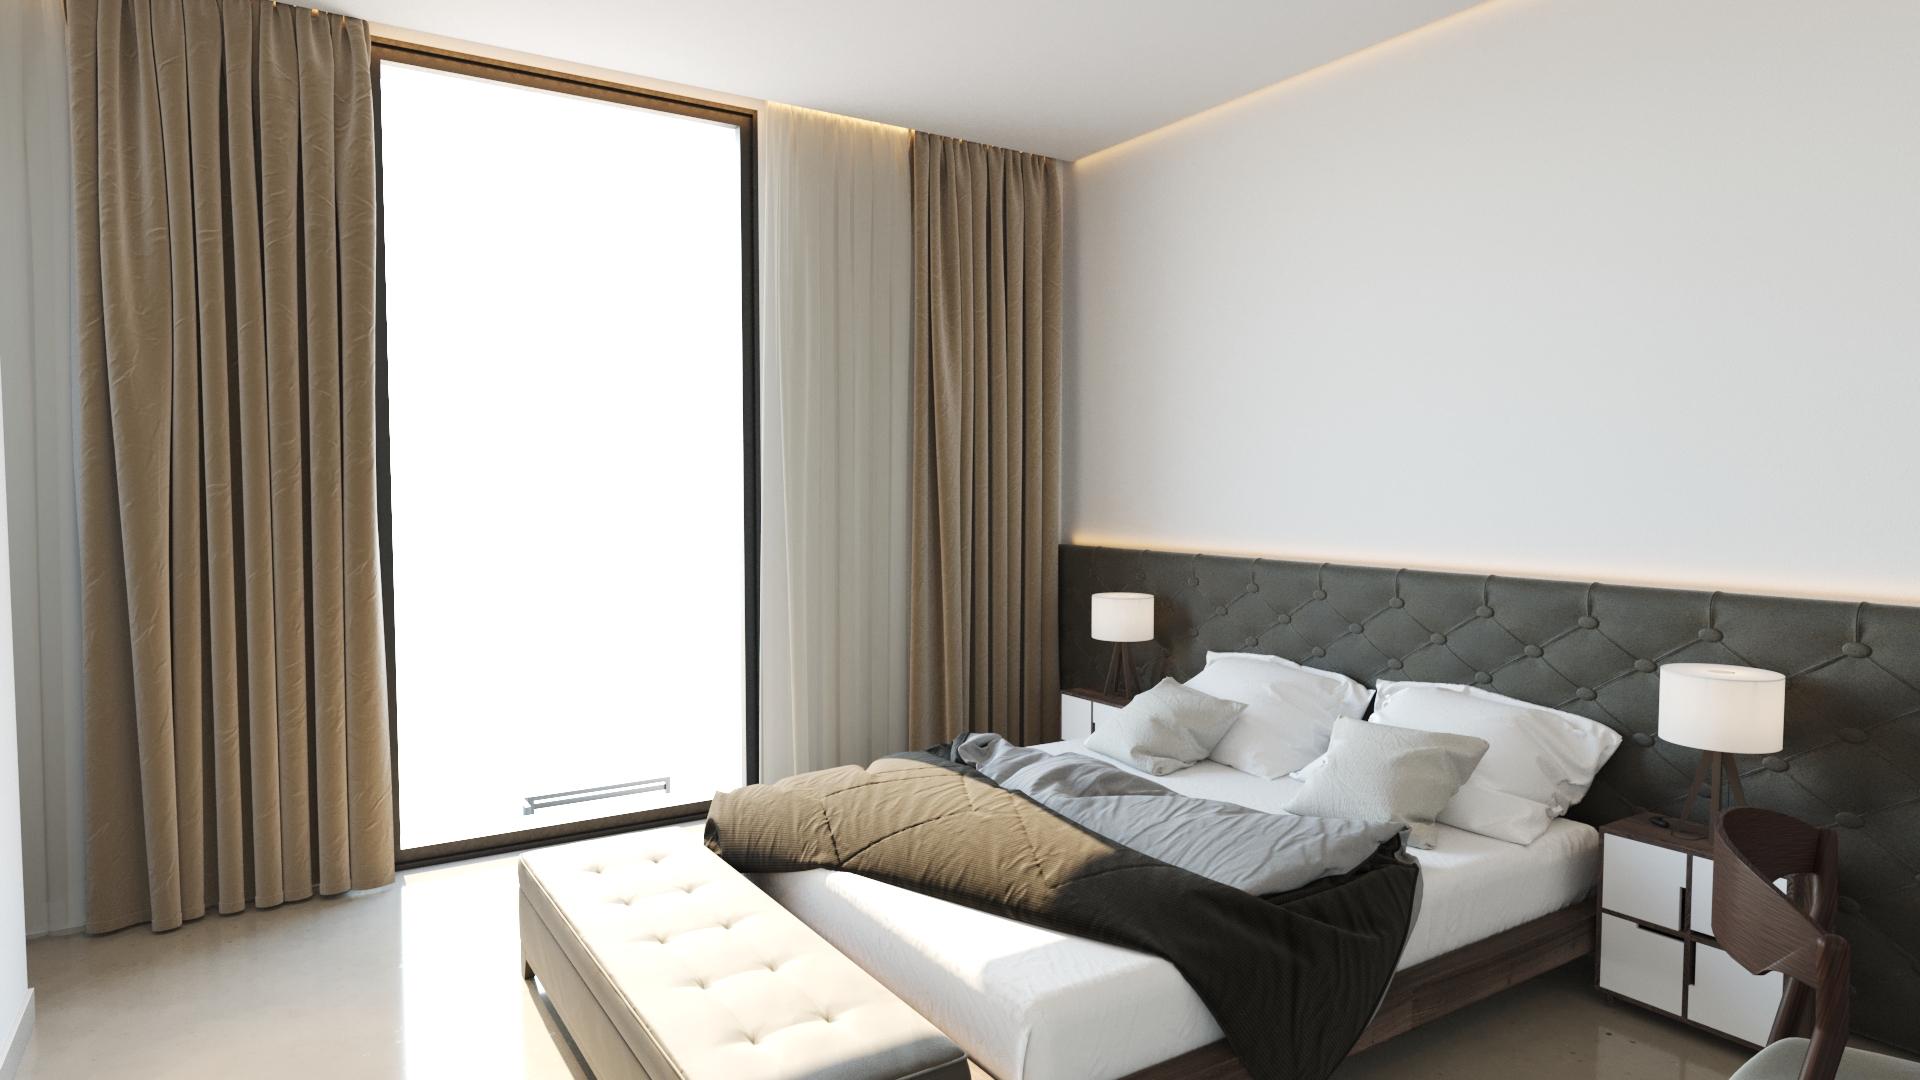 004-DormitorioP-DiaSoleado-V2